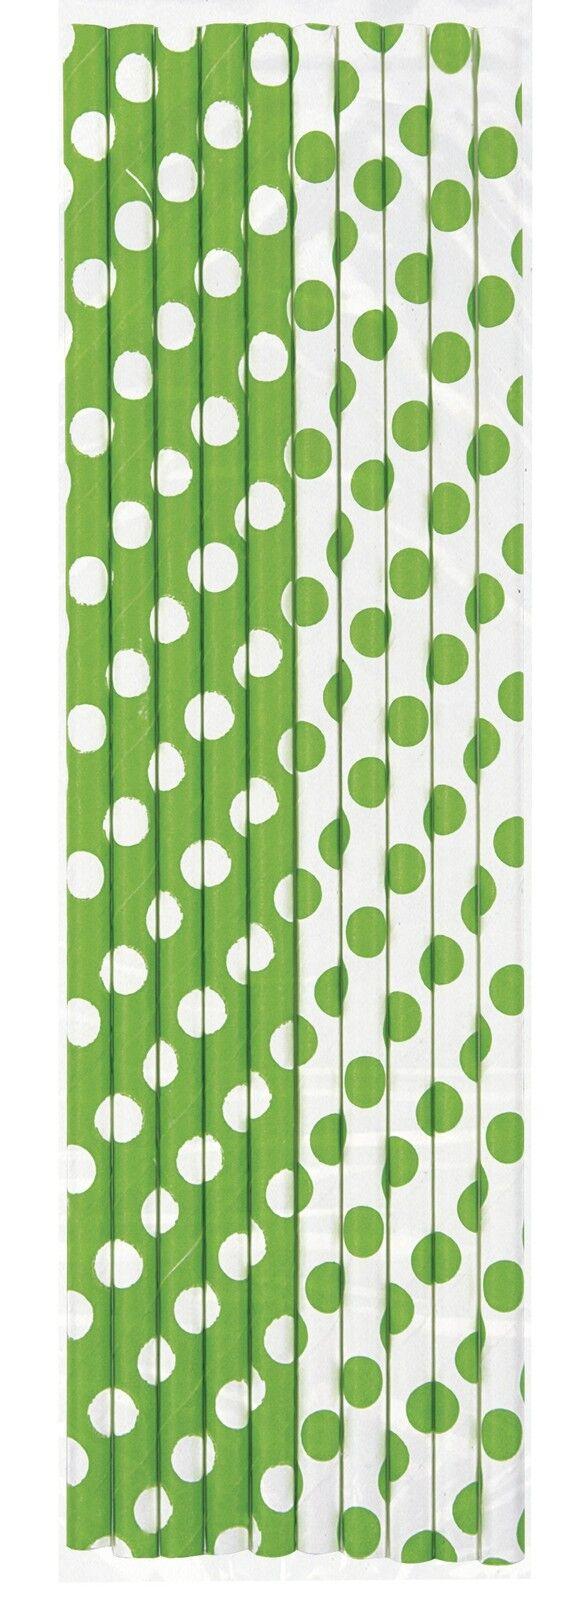 Lime Green /& White Polka Dot Paper PartyCelebrationDrinking Straws 10-60pk